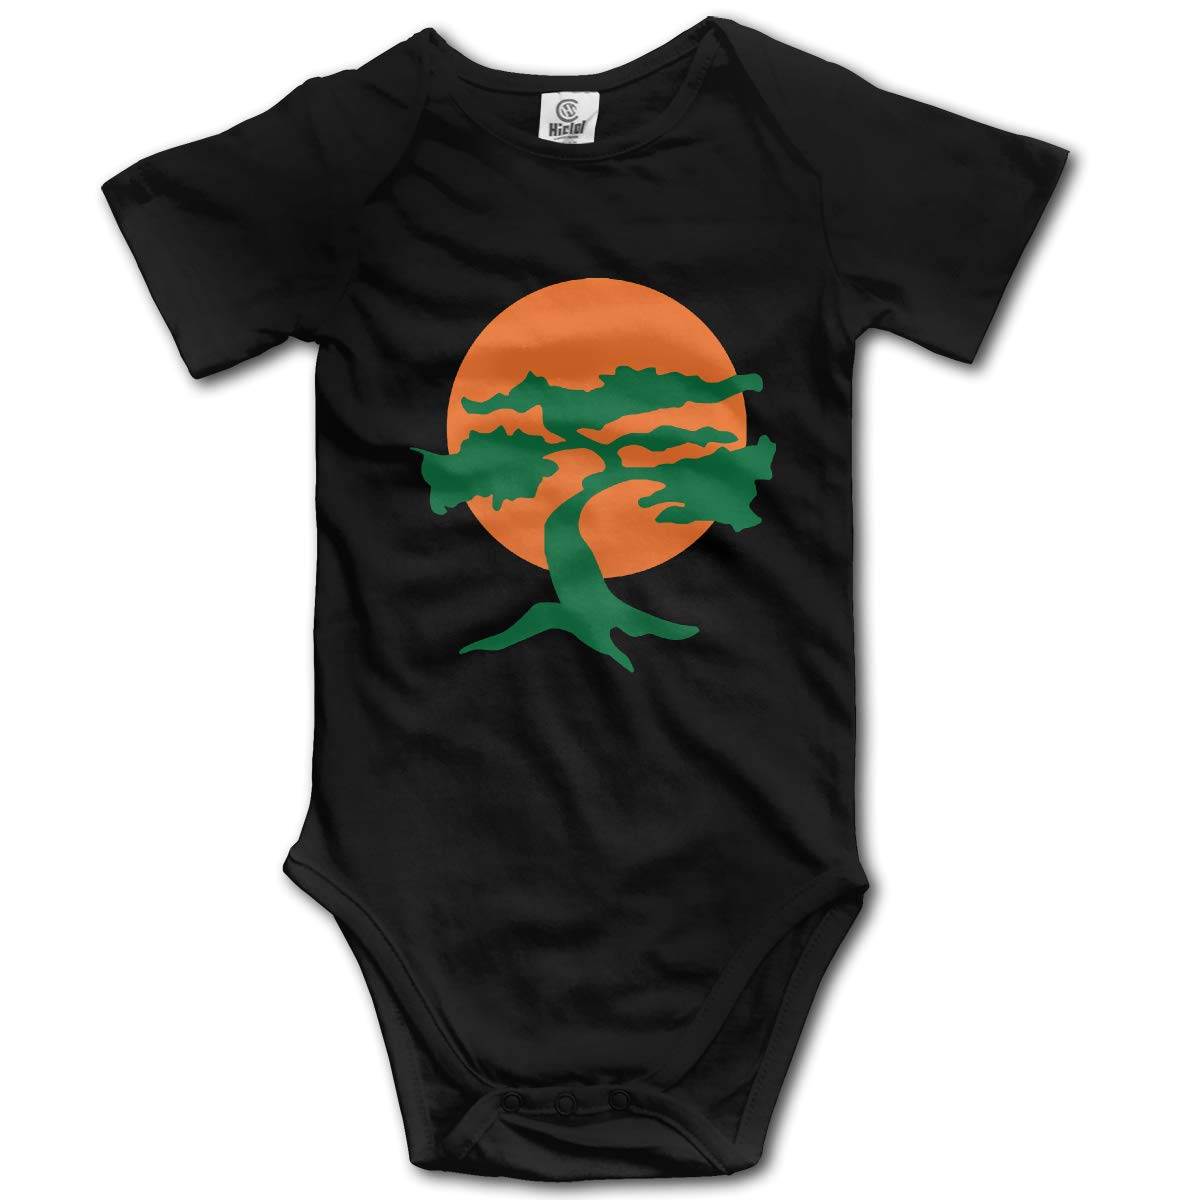 Soft Miyagi Dojo Karate Crawler Tbjrk09-9 Short Sleeve Cotton Bodysuit for Baby Boys and Girls